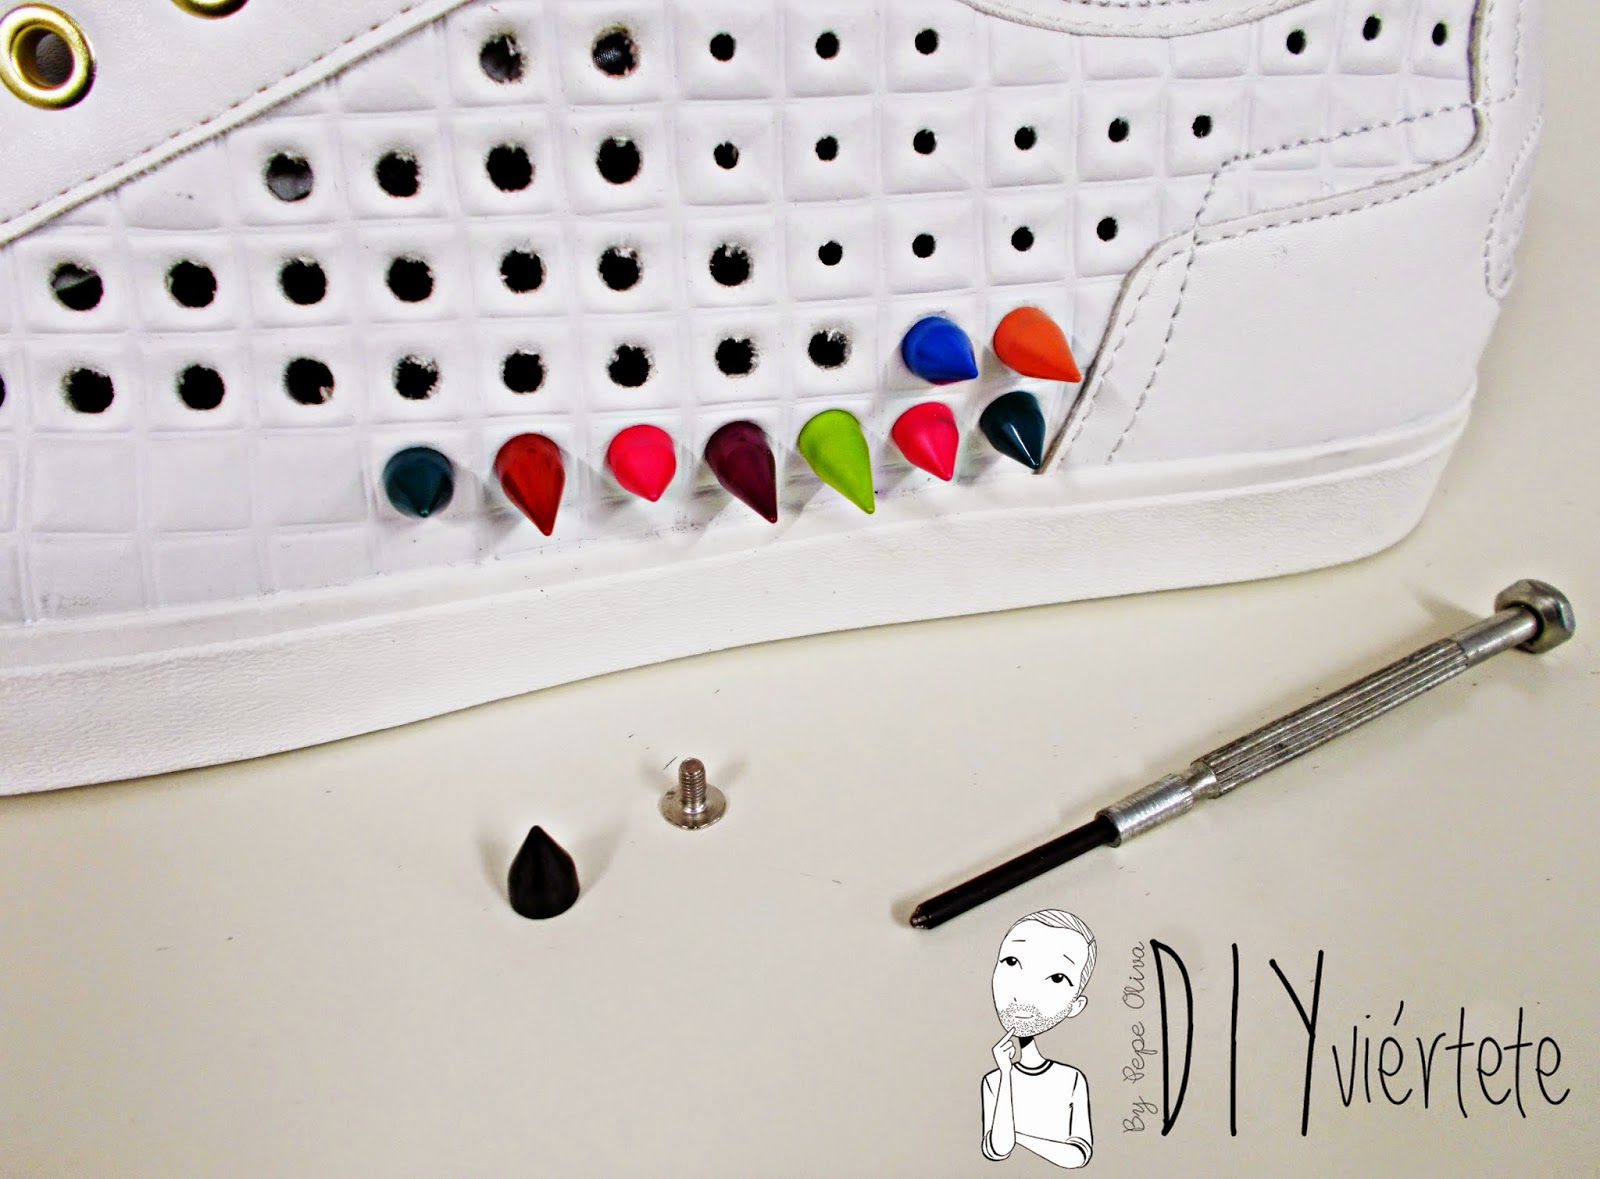 DIY-zapatillas-tunear-customizar-CHRISTIAN-LOUBOUTIN-zapatos-pinchos-esmaltes-pinta uñas-colores-10